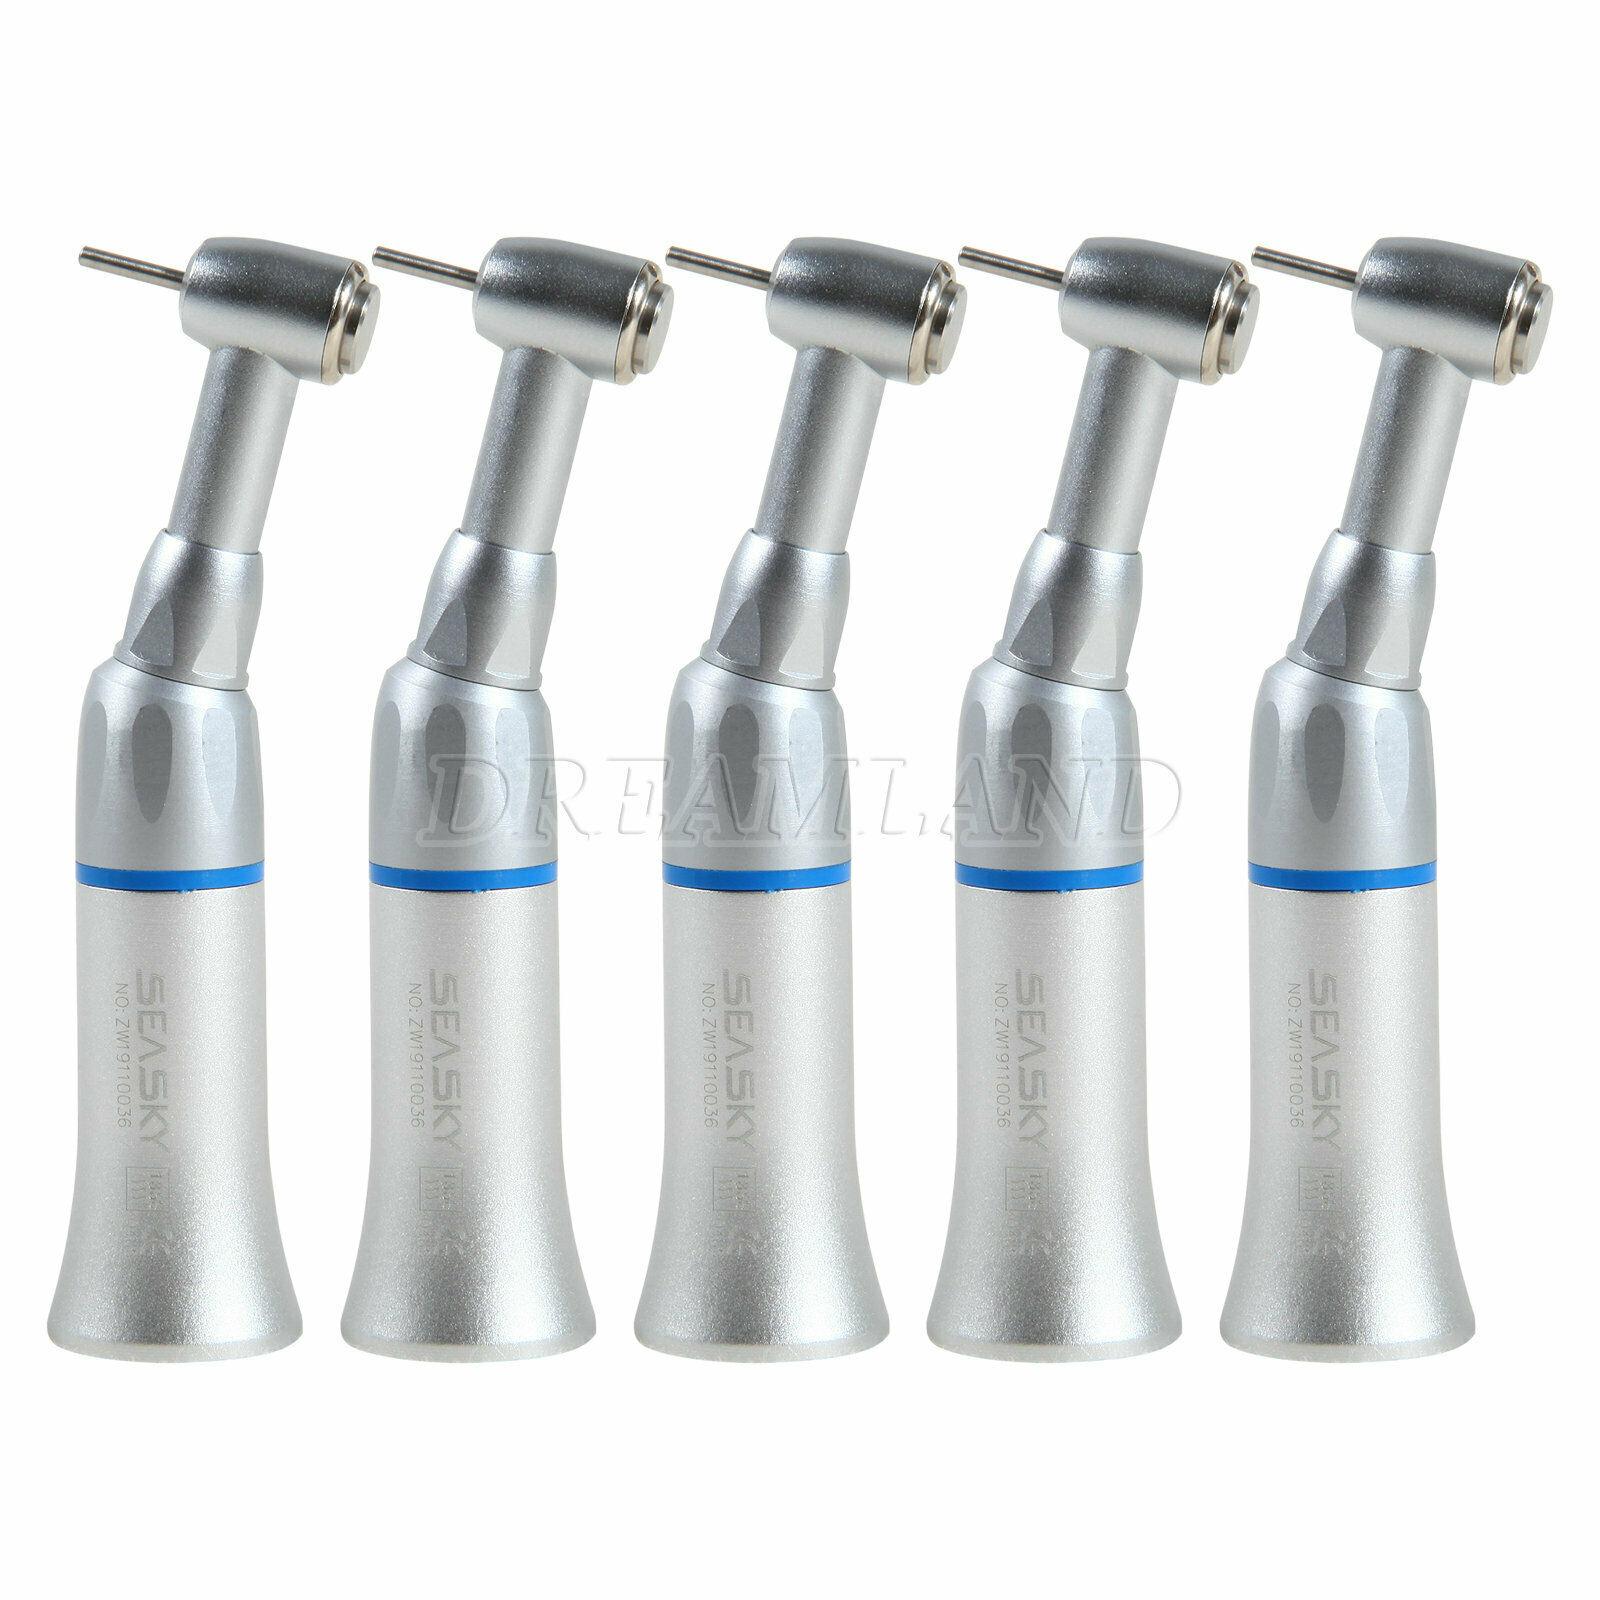 5PCS Dental Contra Angle Low Speed Handpiece Push E-type Fit FG Burs 1.6mm